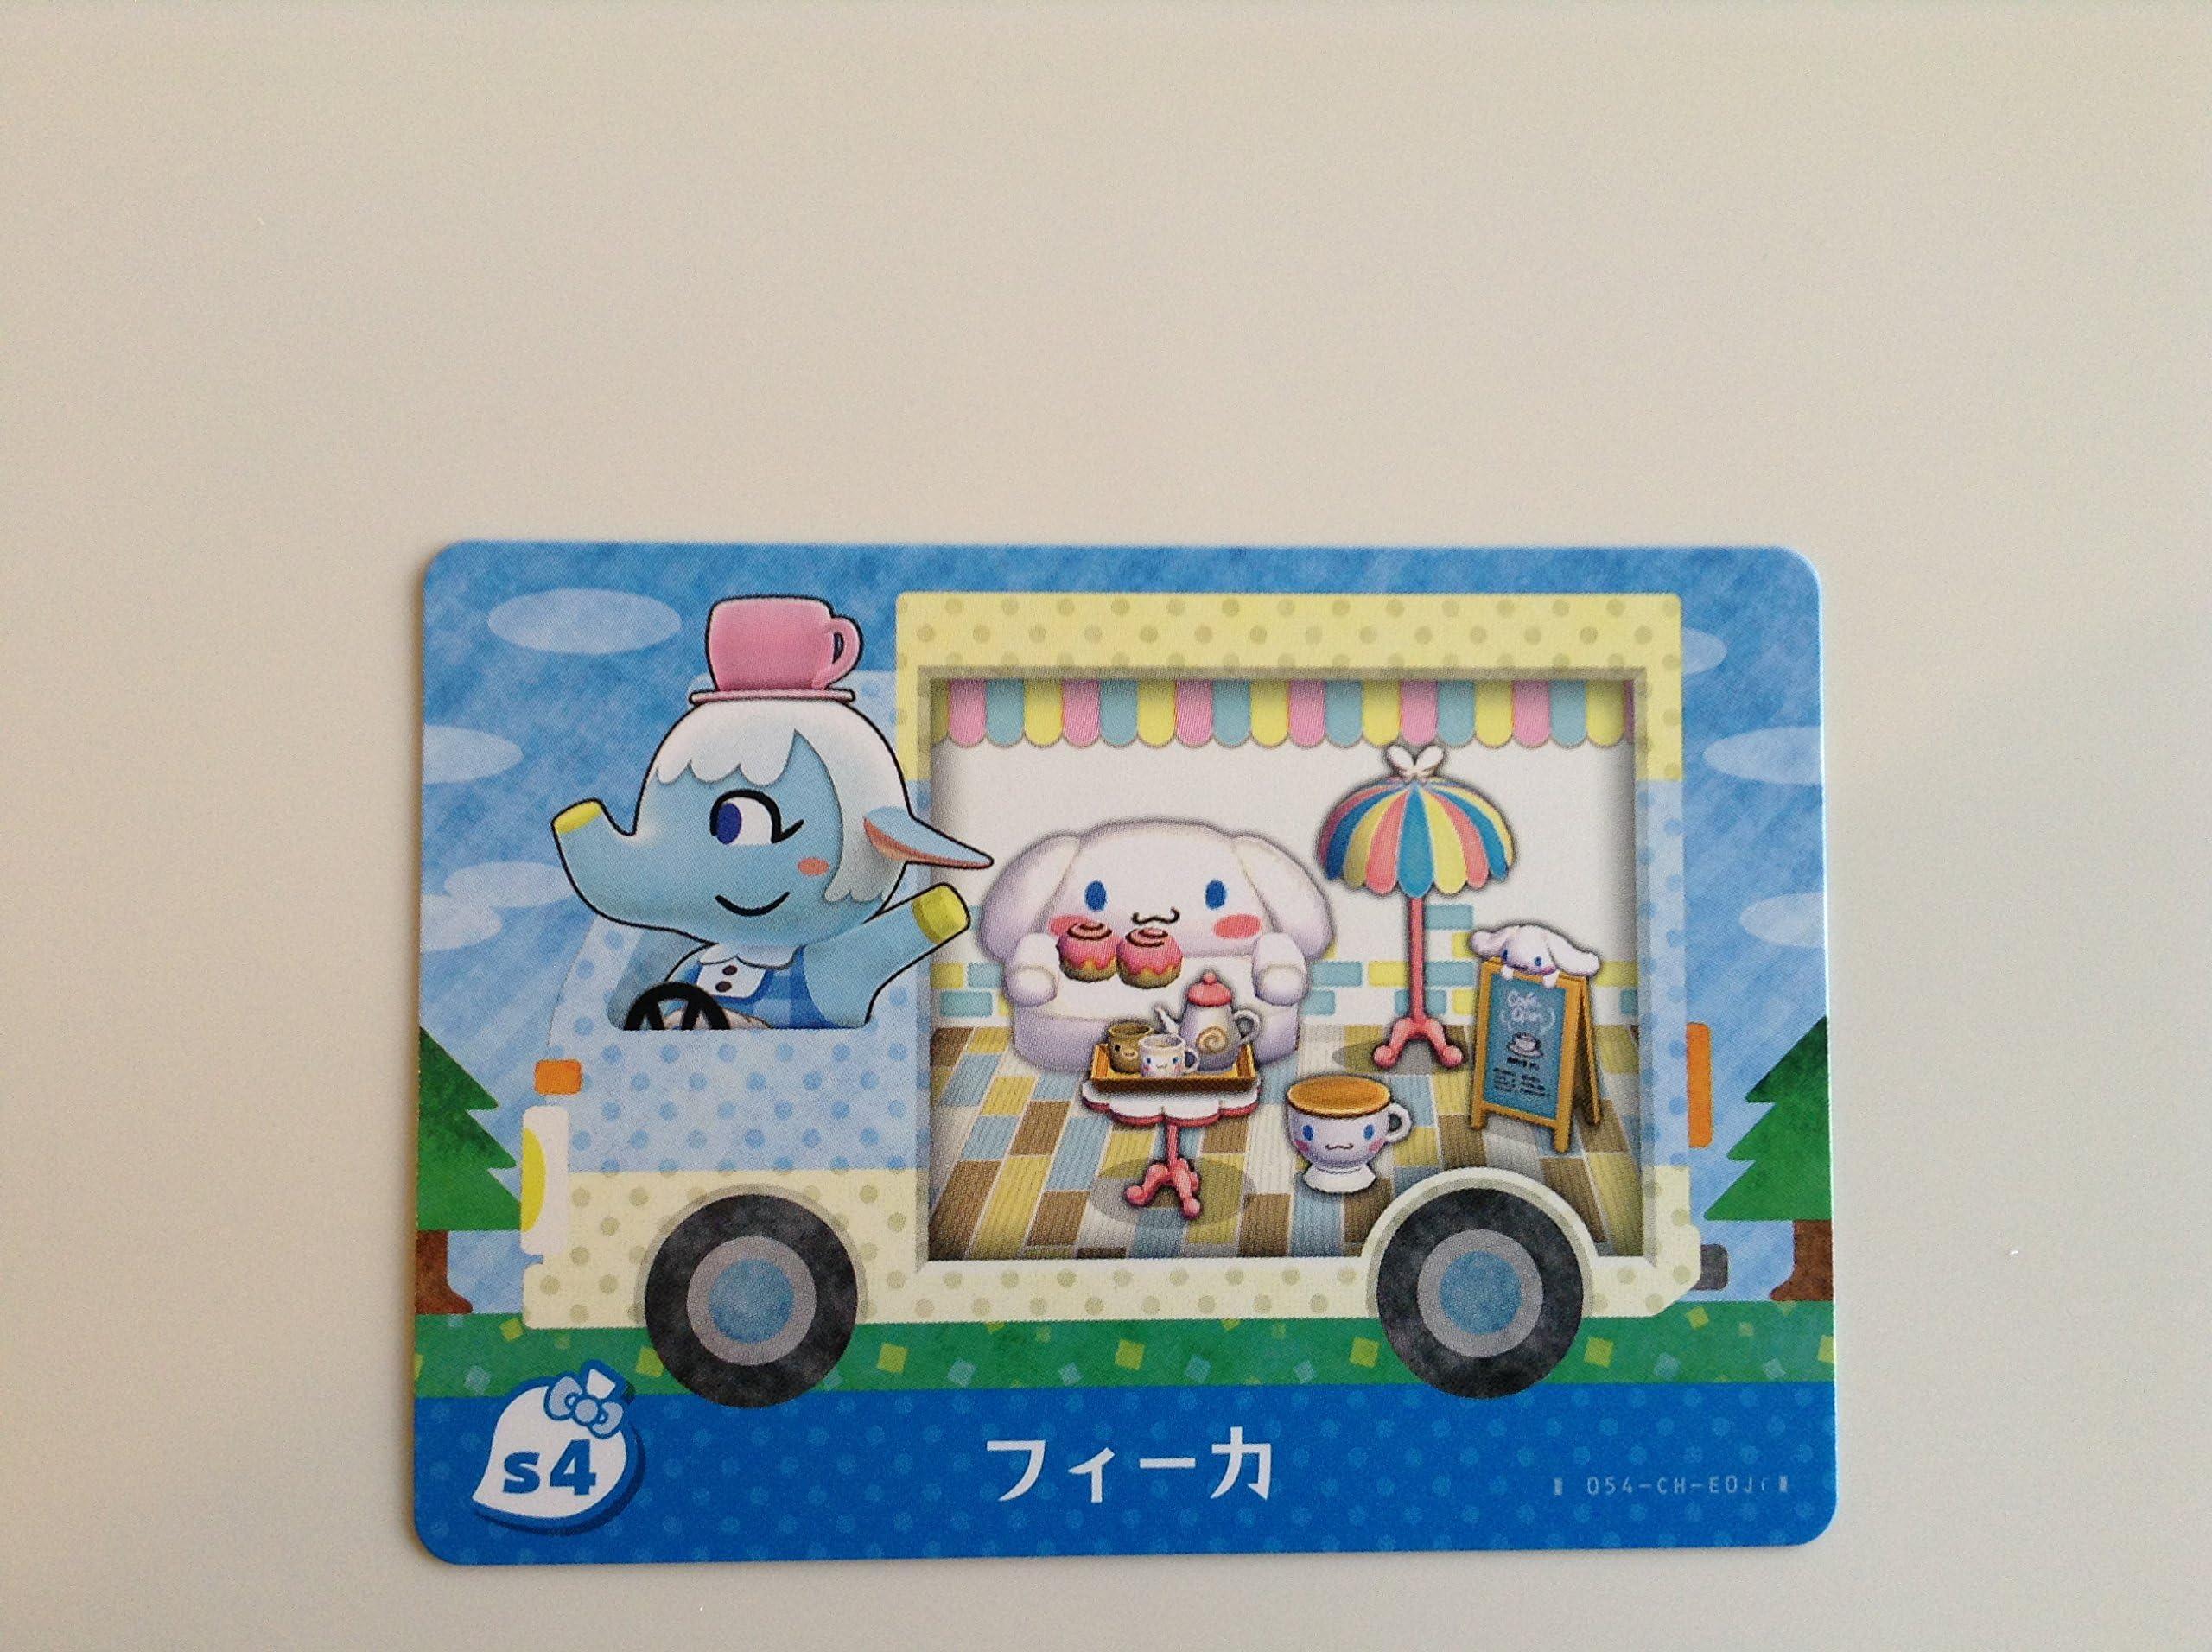 e3125a17f Amazon.com: Chai - S4 - Nintendo Animal Crossing New Leaf Sanrio ...